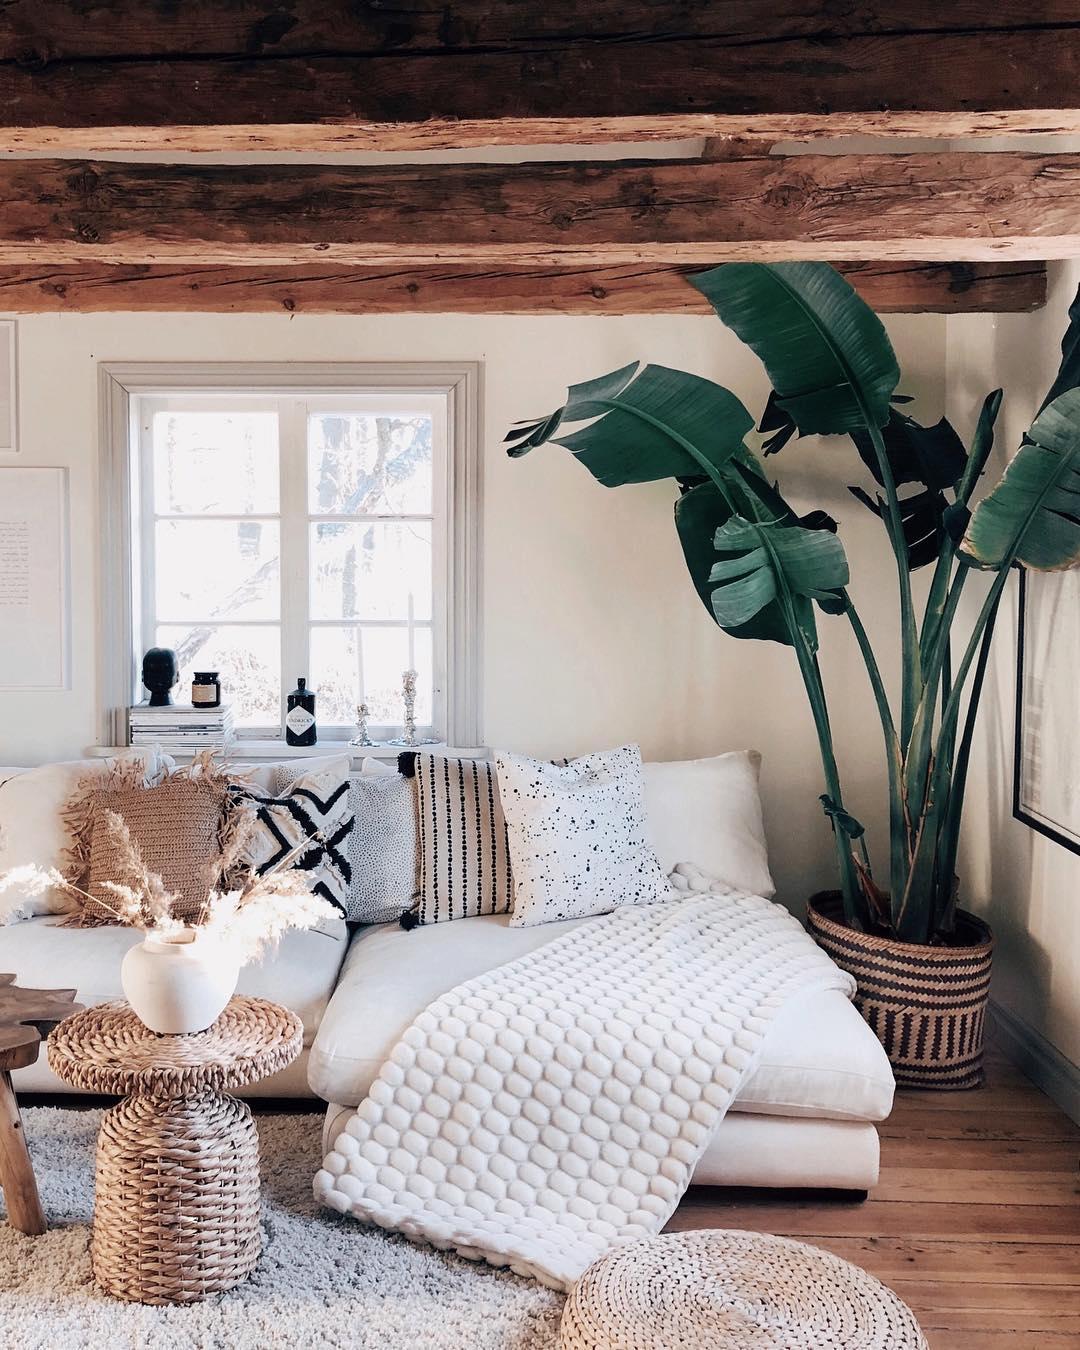 40-most-beautiful-living-room-ideas-2019